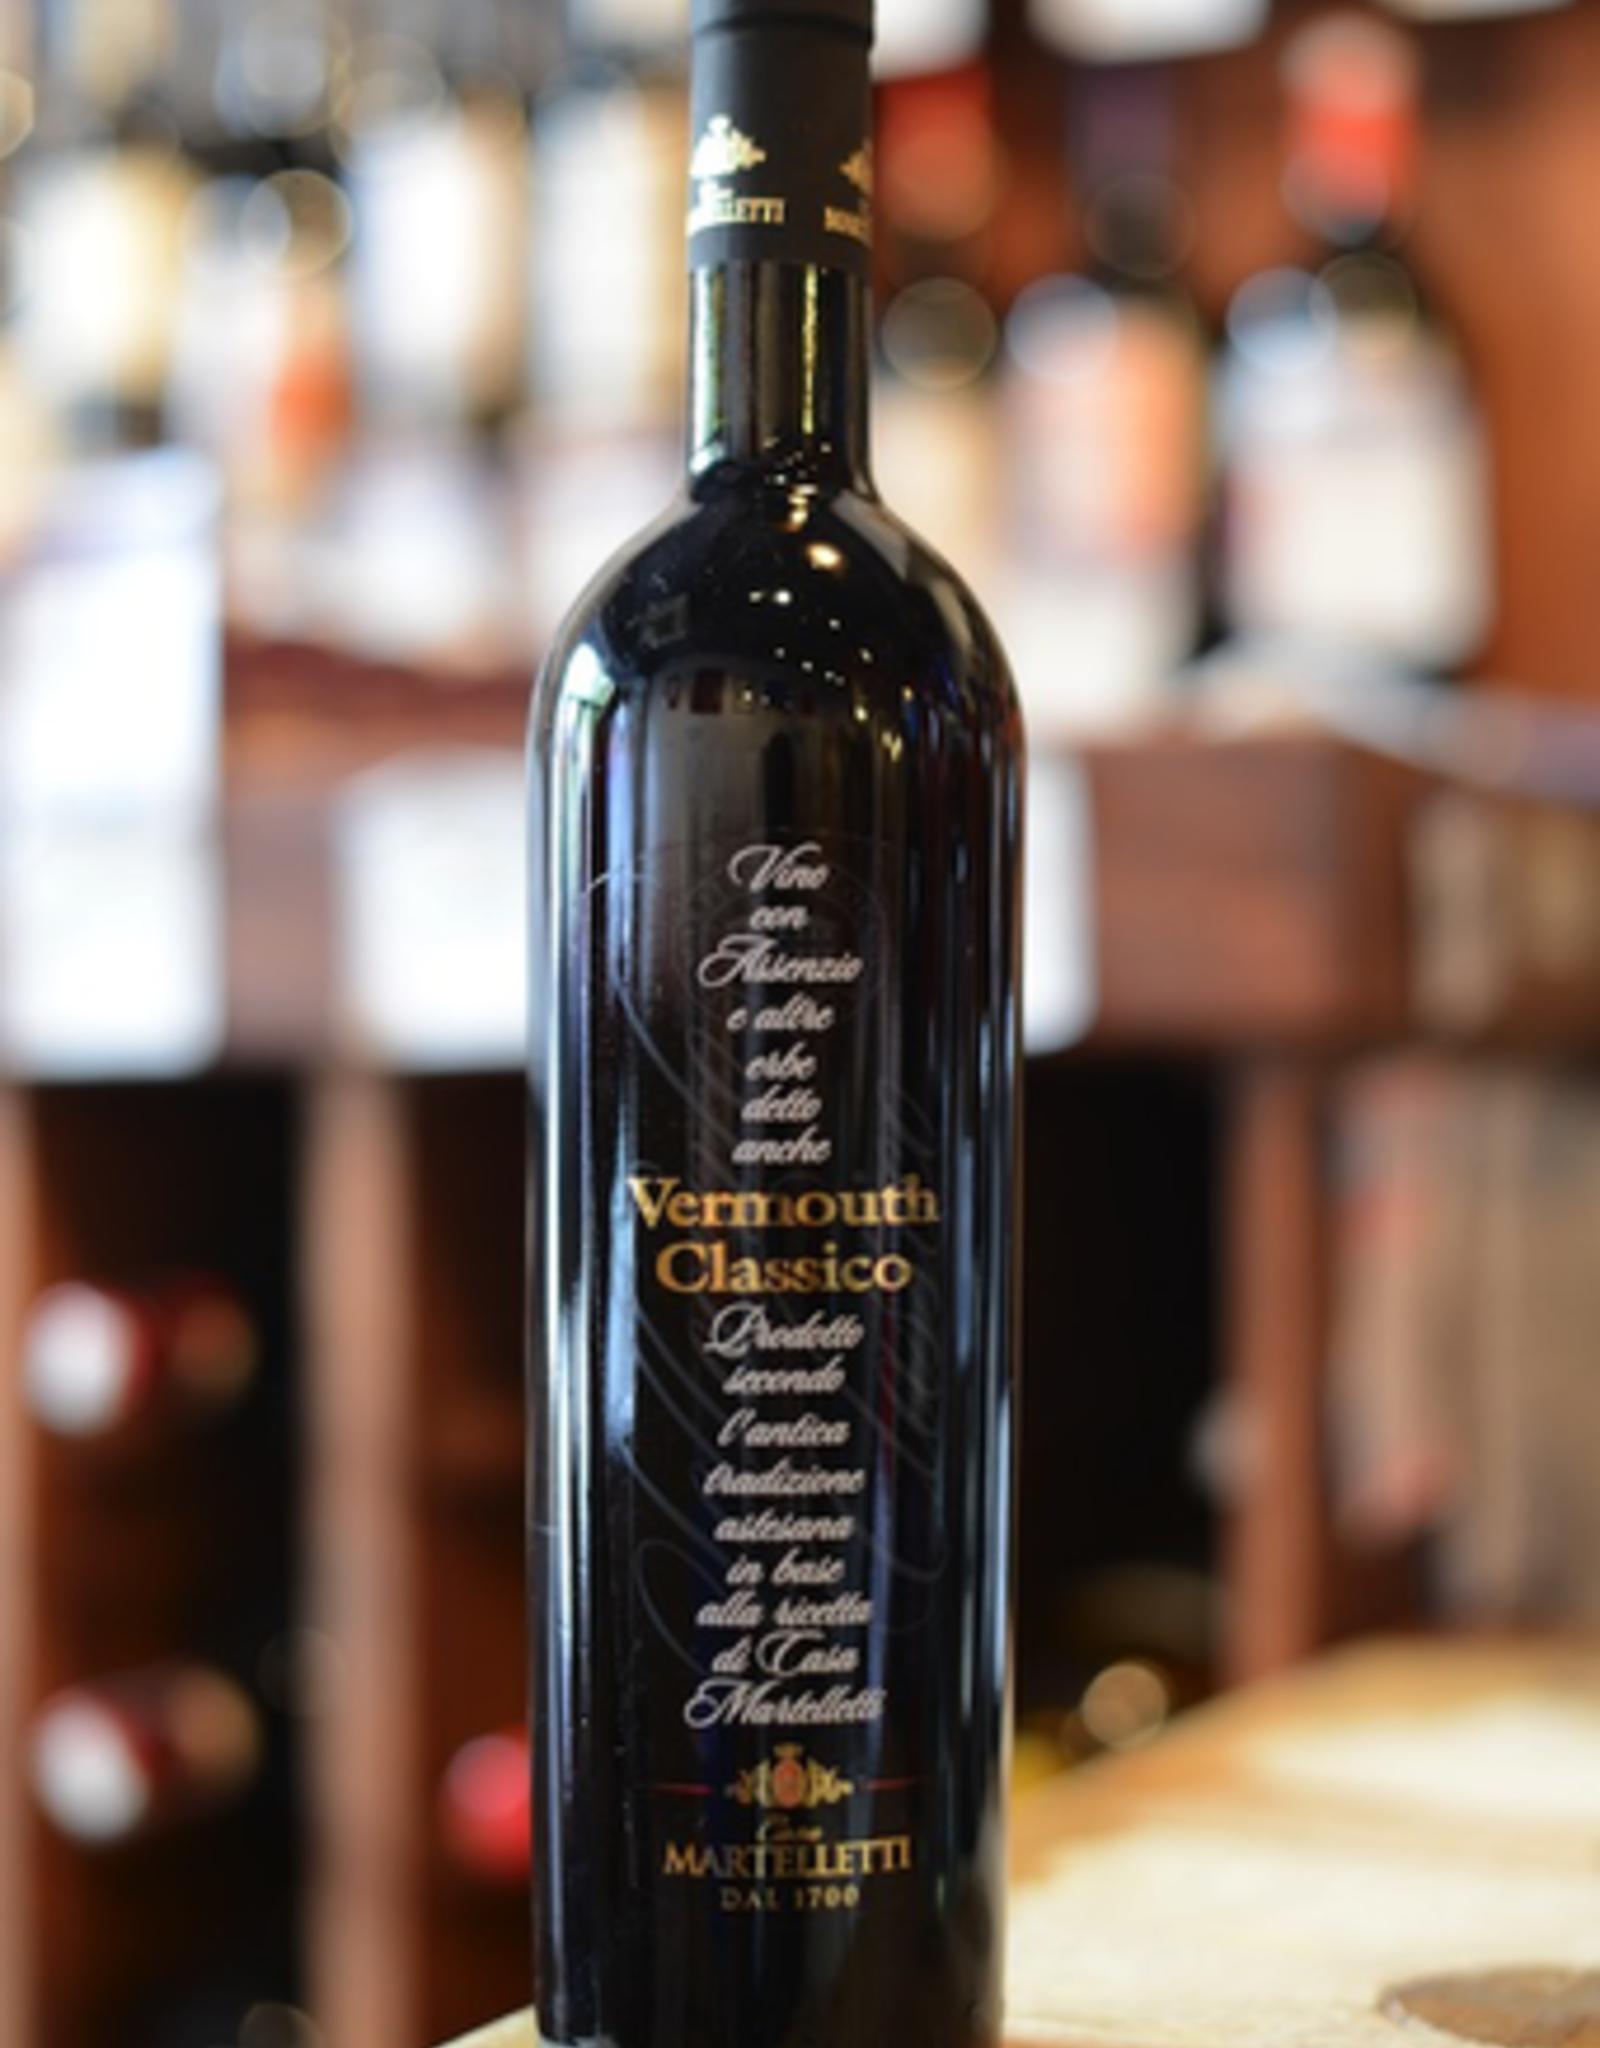 Casa Martelletti Sweet Vermouth Classico - Piedmont, Italy (750ml)